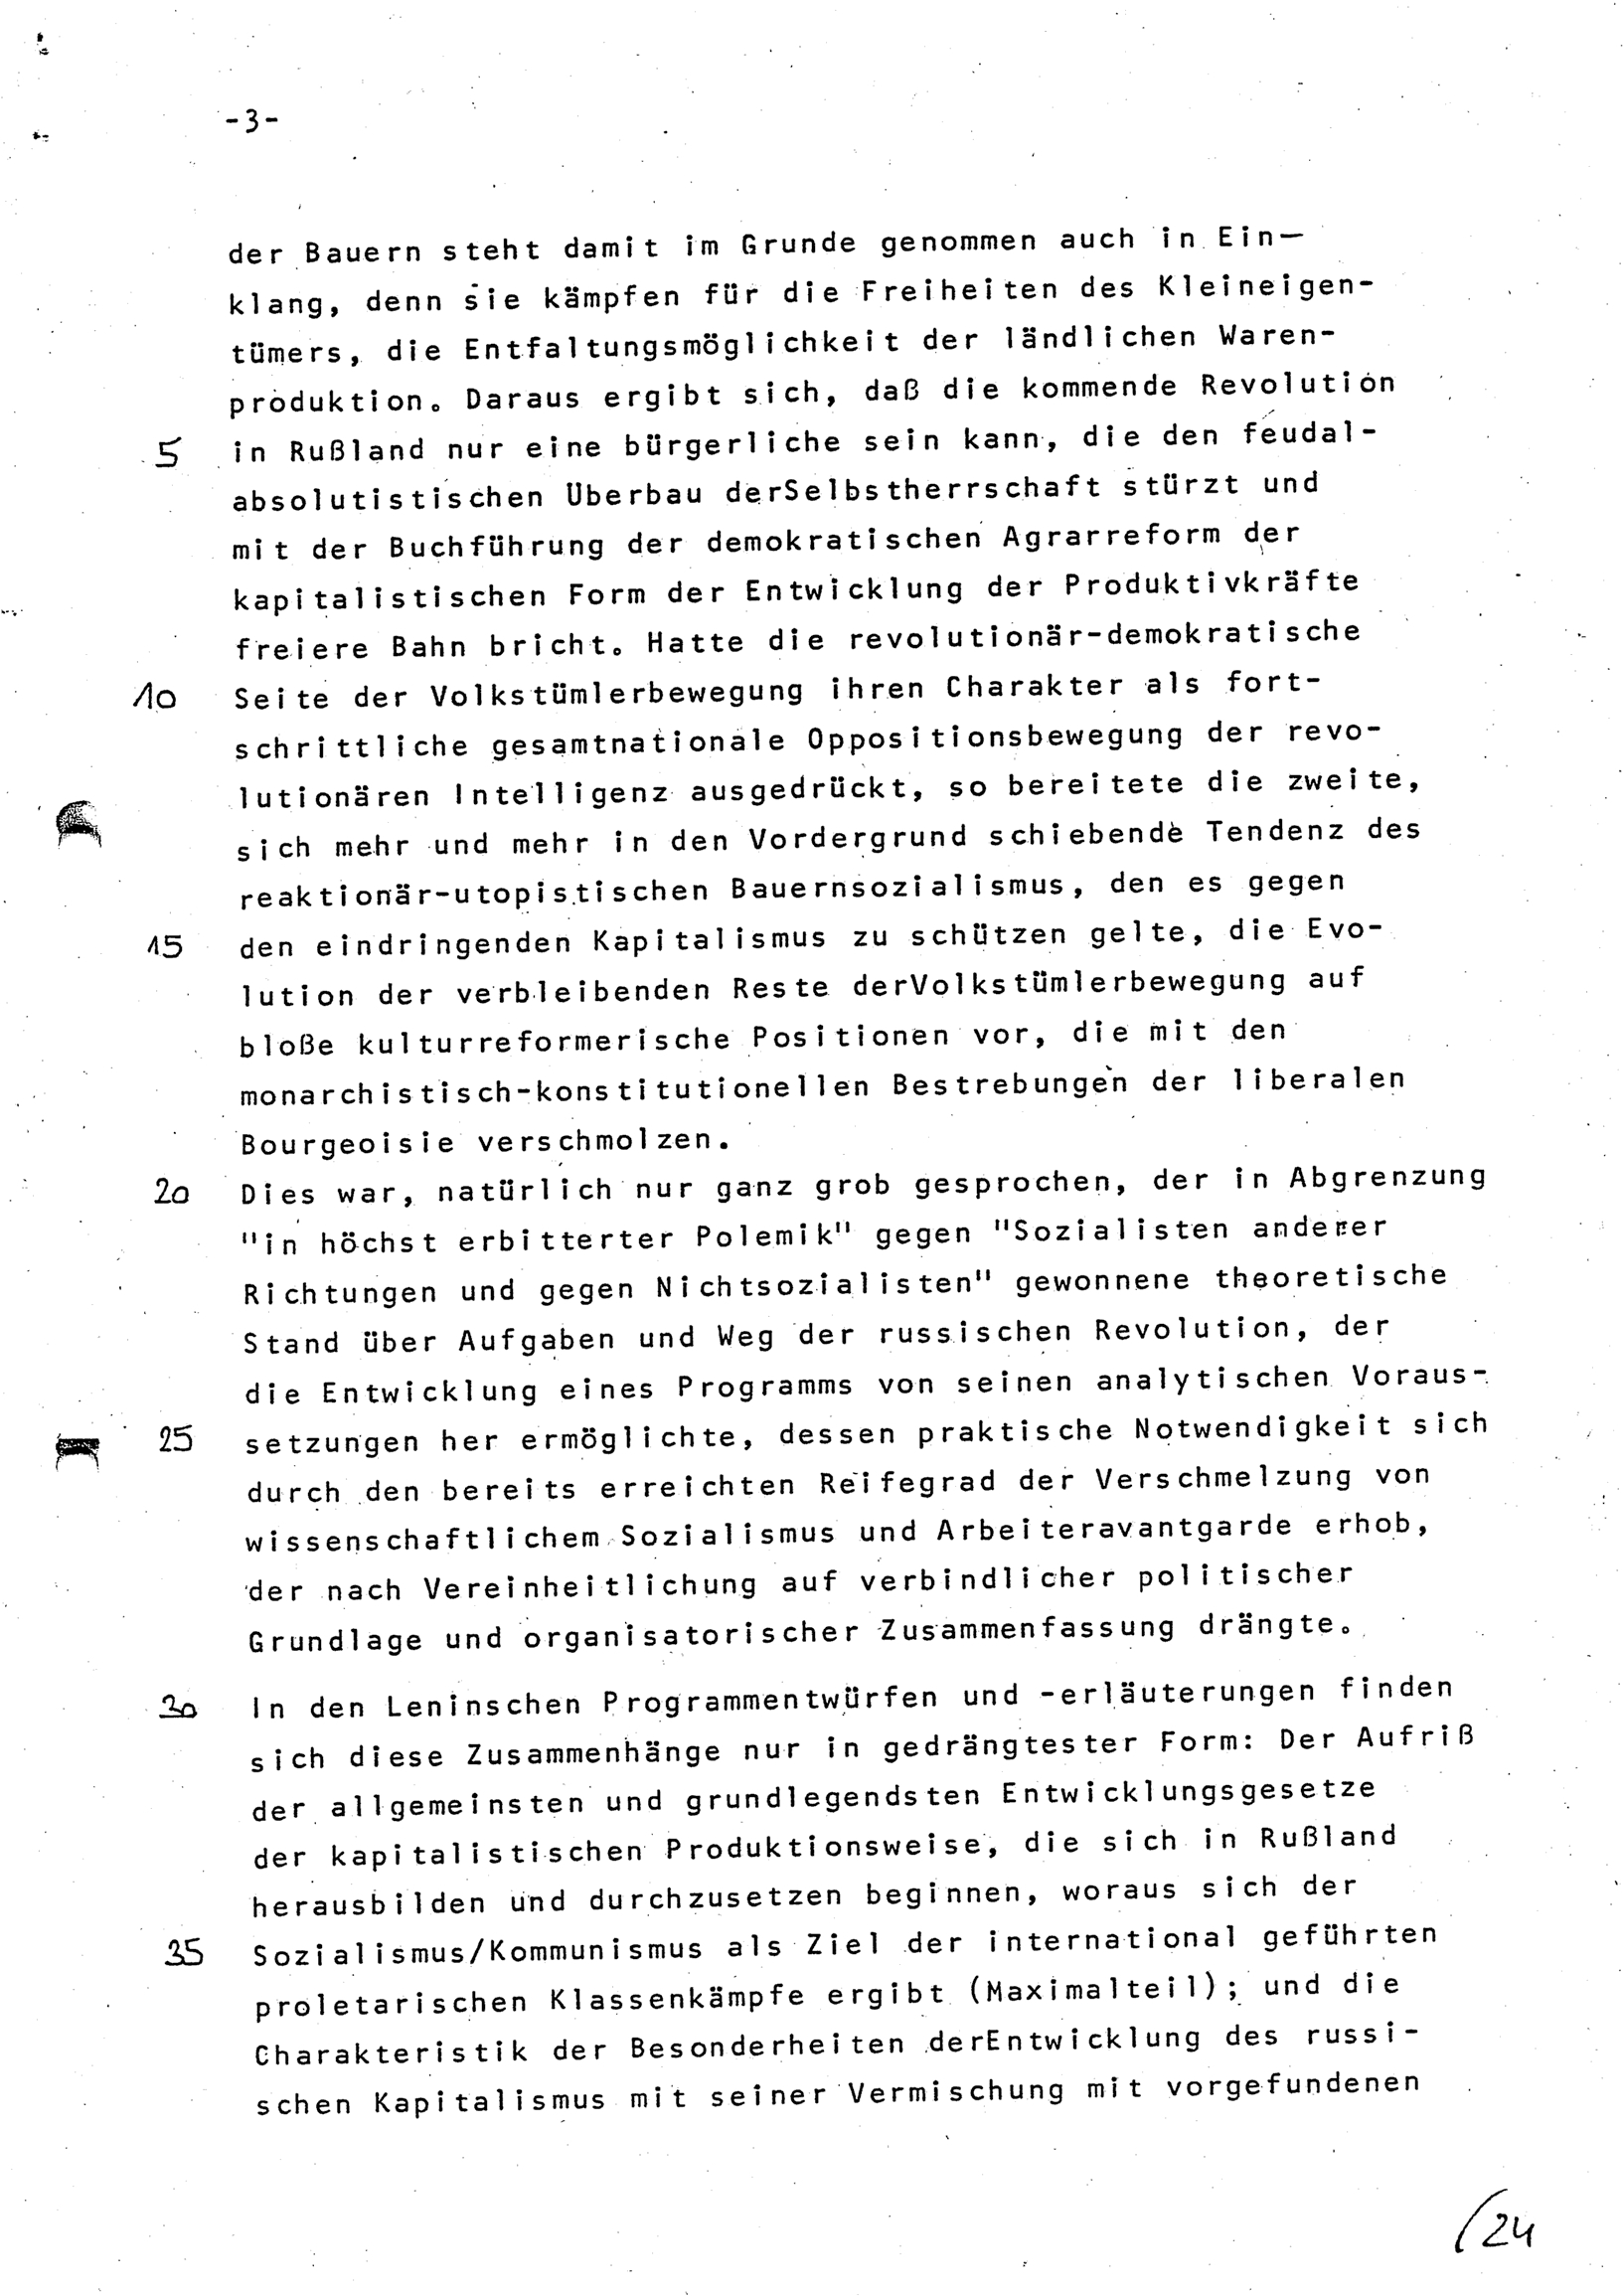 Ulm_KGU_Arbeitsheft_19830425_015_027